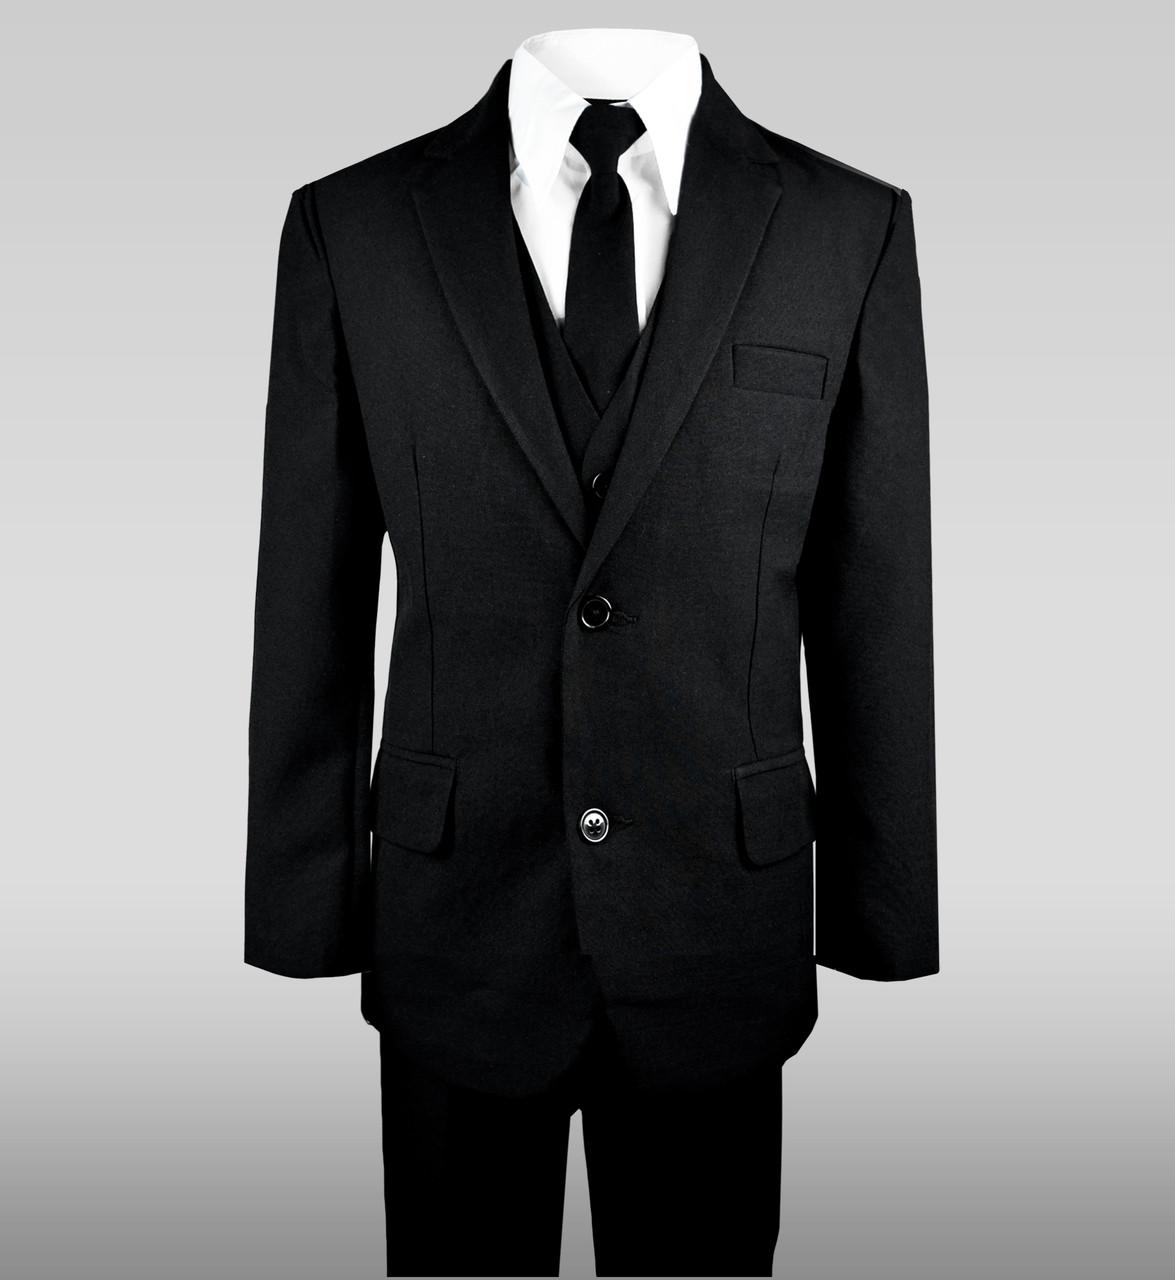 3f0d81a43 Boy s Solid Black Notch Lapel Suit w  a Skinny Tie